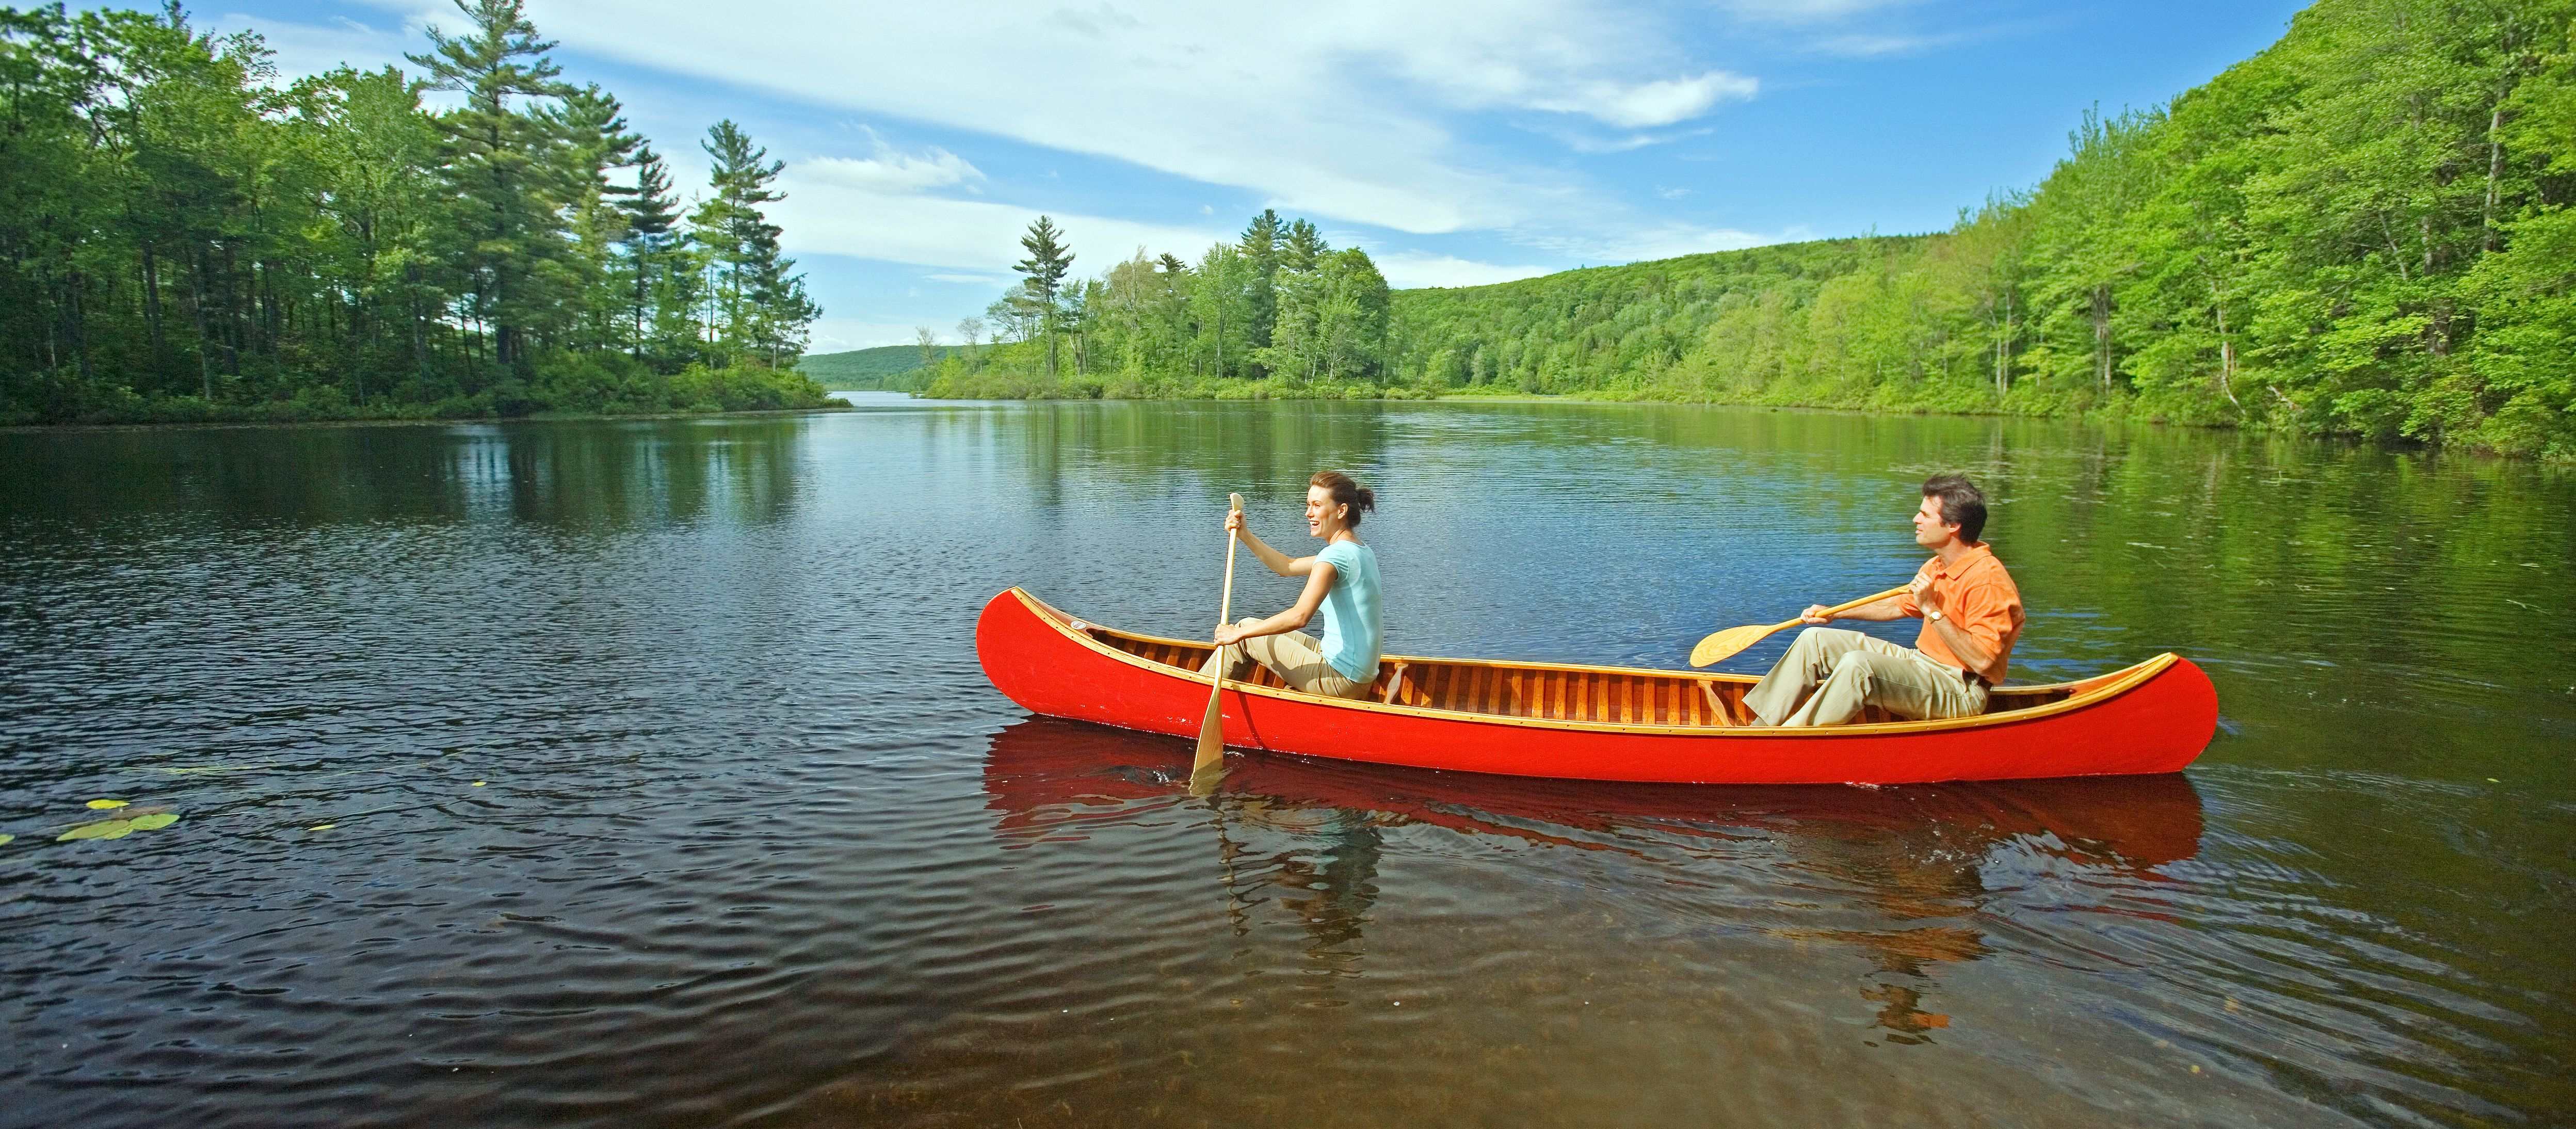 Kanutour auf dem Wood Creek Pond